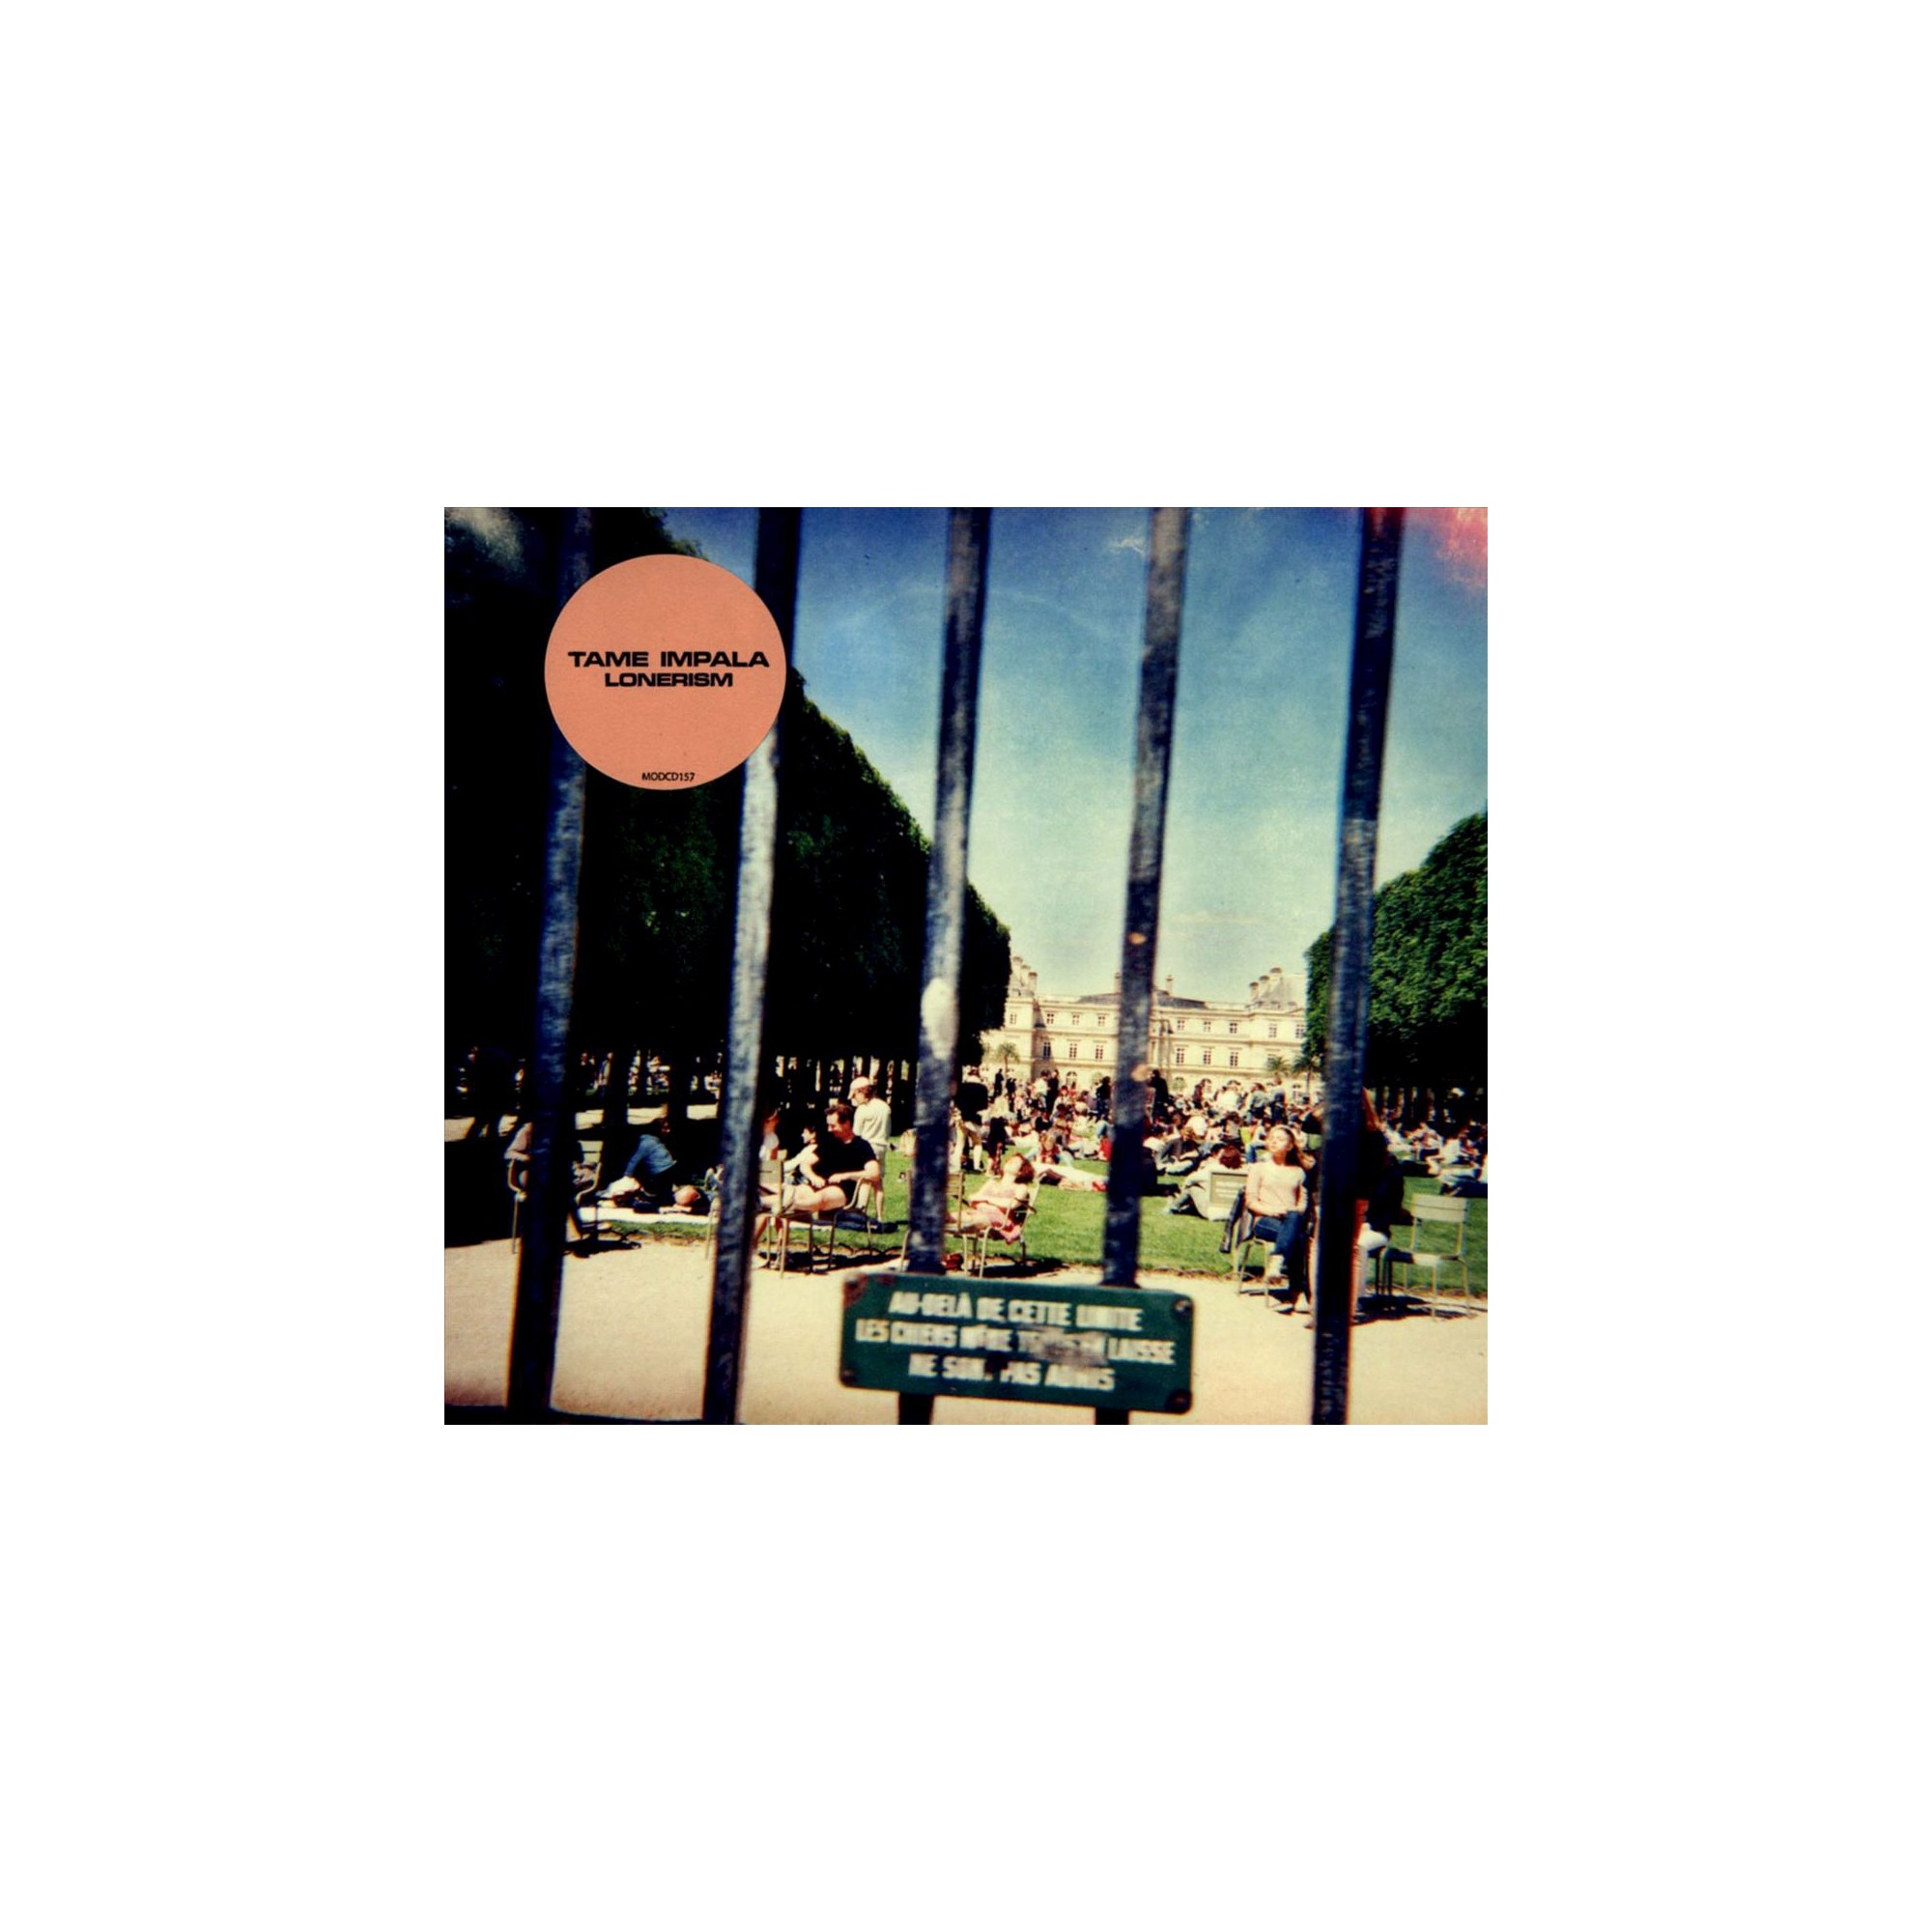 Tame impala - Lonerism (CD)